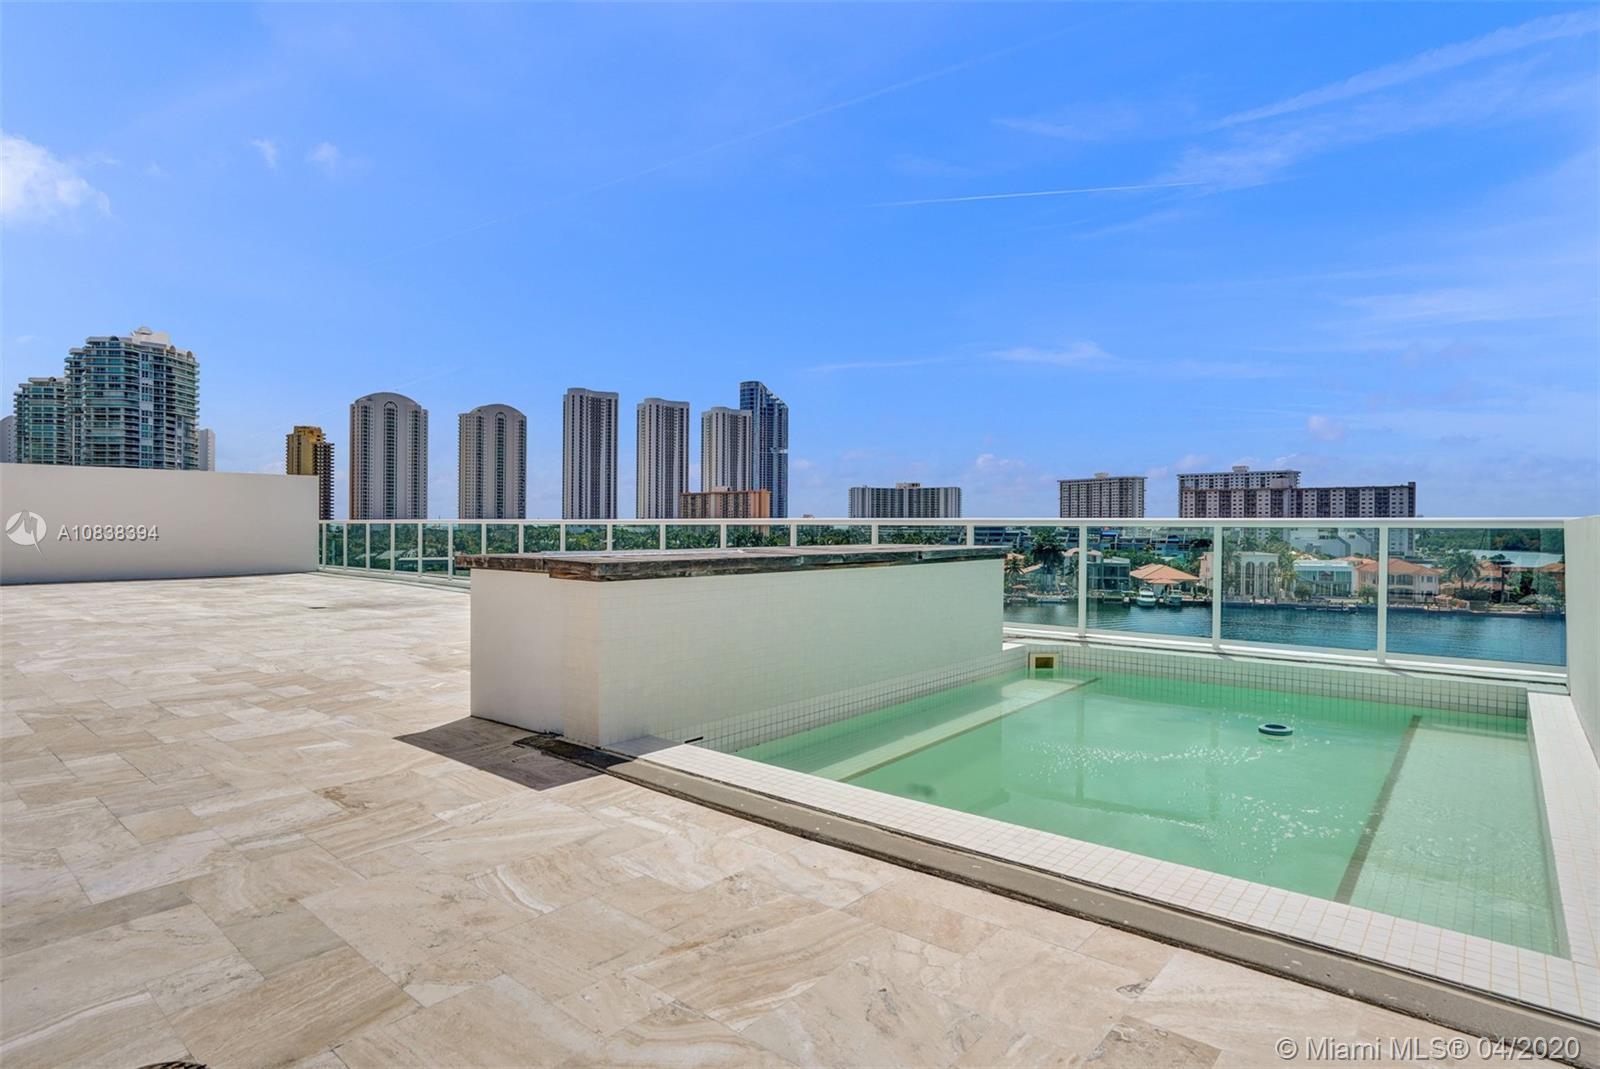 DREAM UNIT AMAZING DEAL, MOTIVATED SELLER !!!! LUXURY SUNNY ISLES BUILDING, HUGE CORNER LANAI UNIT W